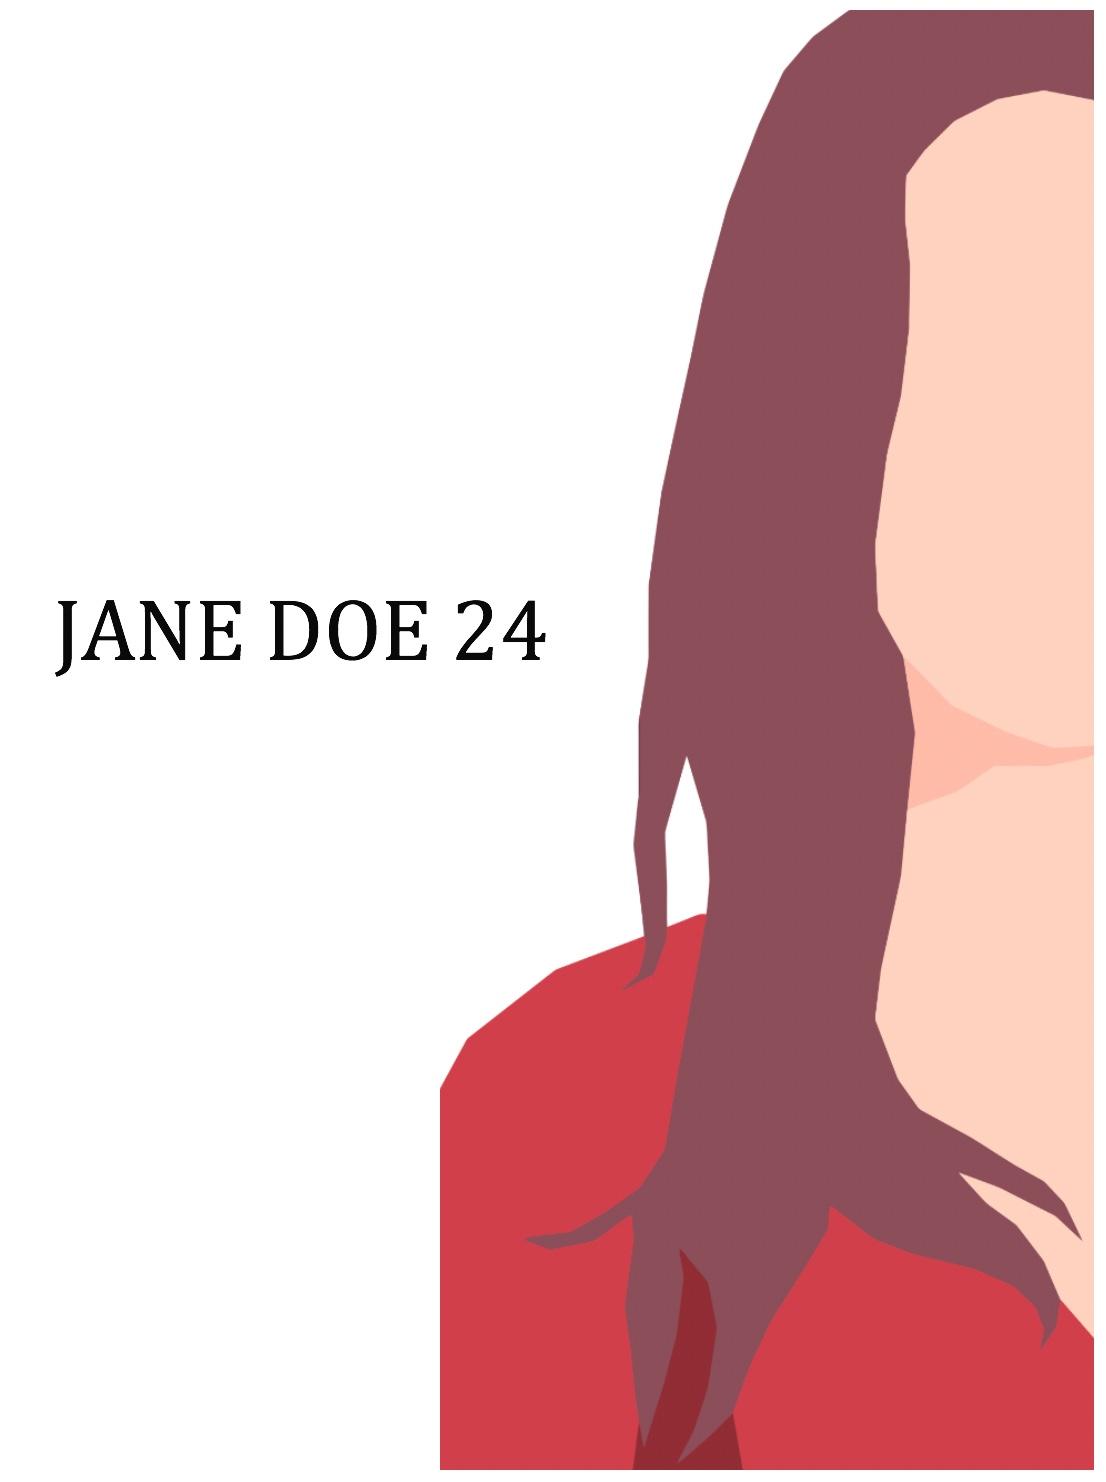 Jane Doe 24.jpeg